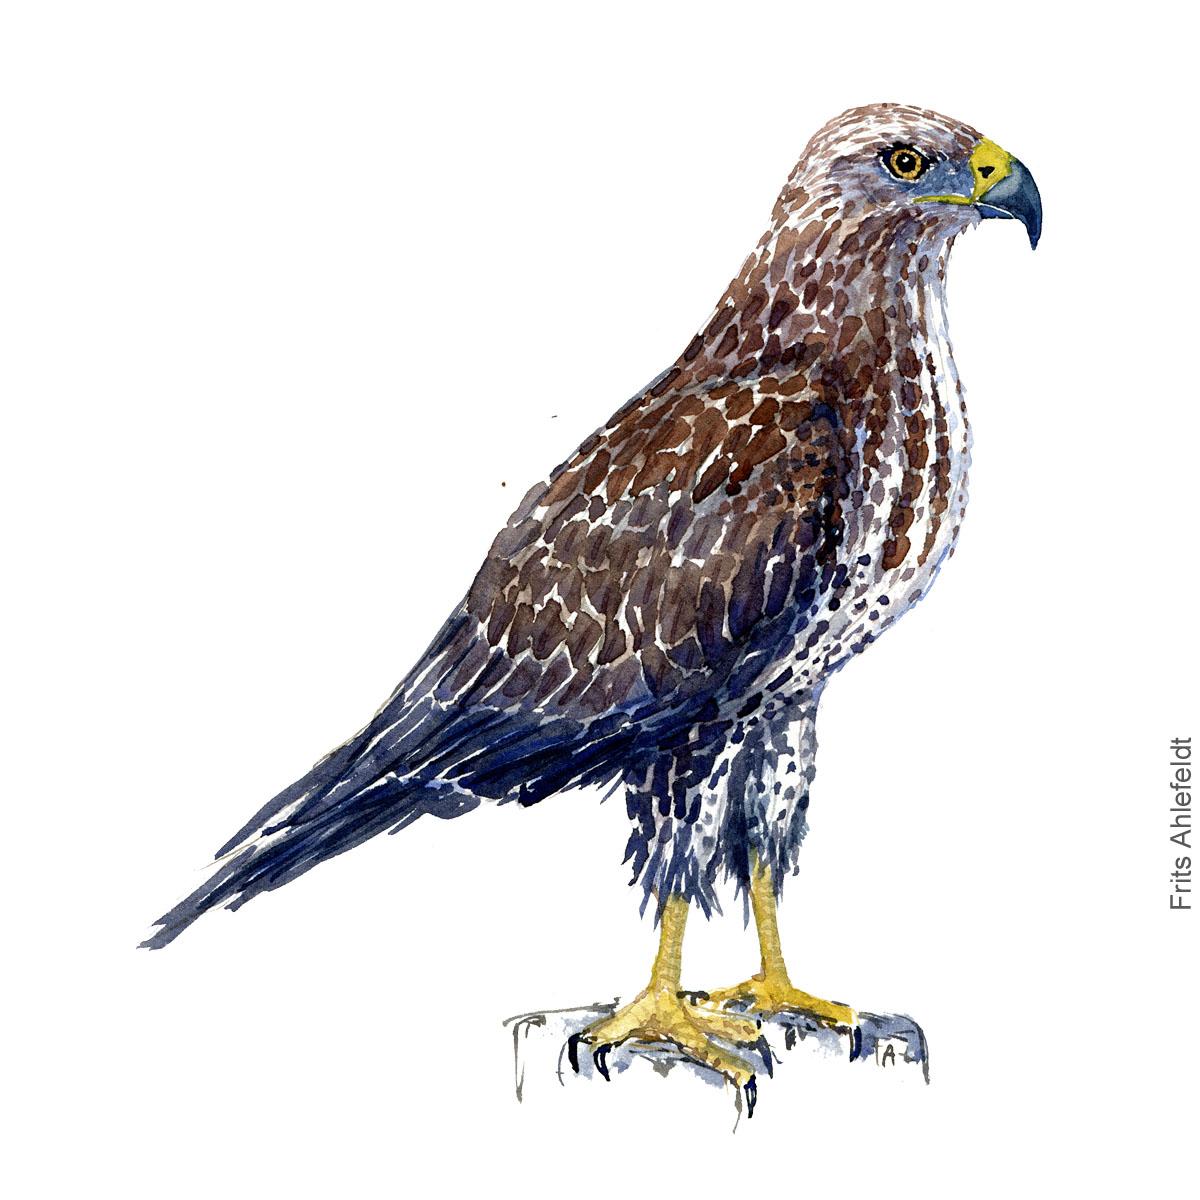 Buzzard - Musvaage Akvarel. Watercolor bird illustration by Frits Ahlefeldt